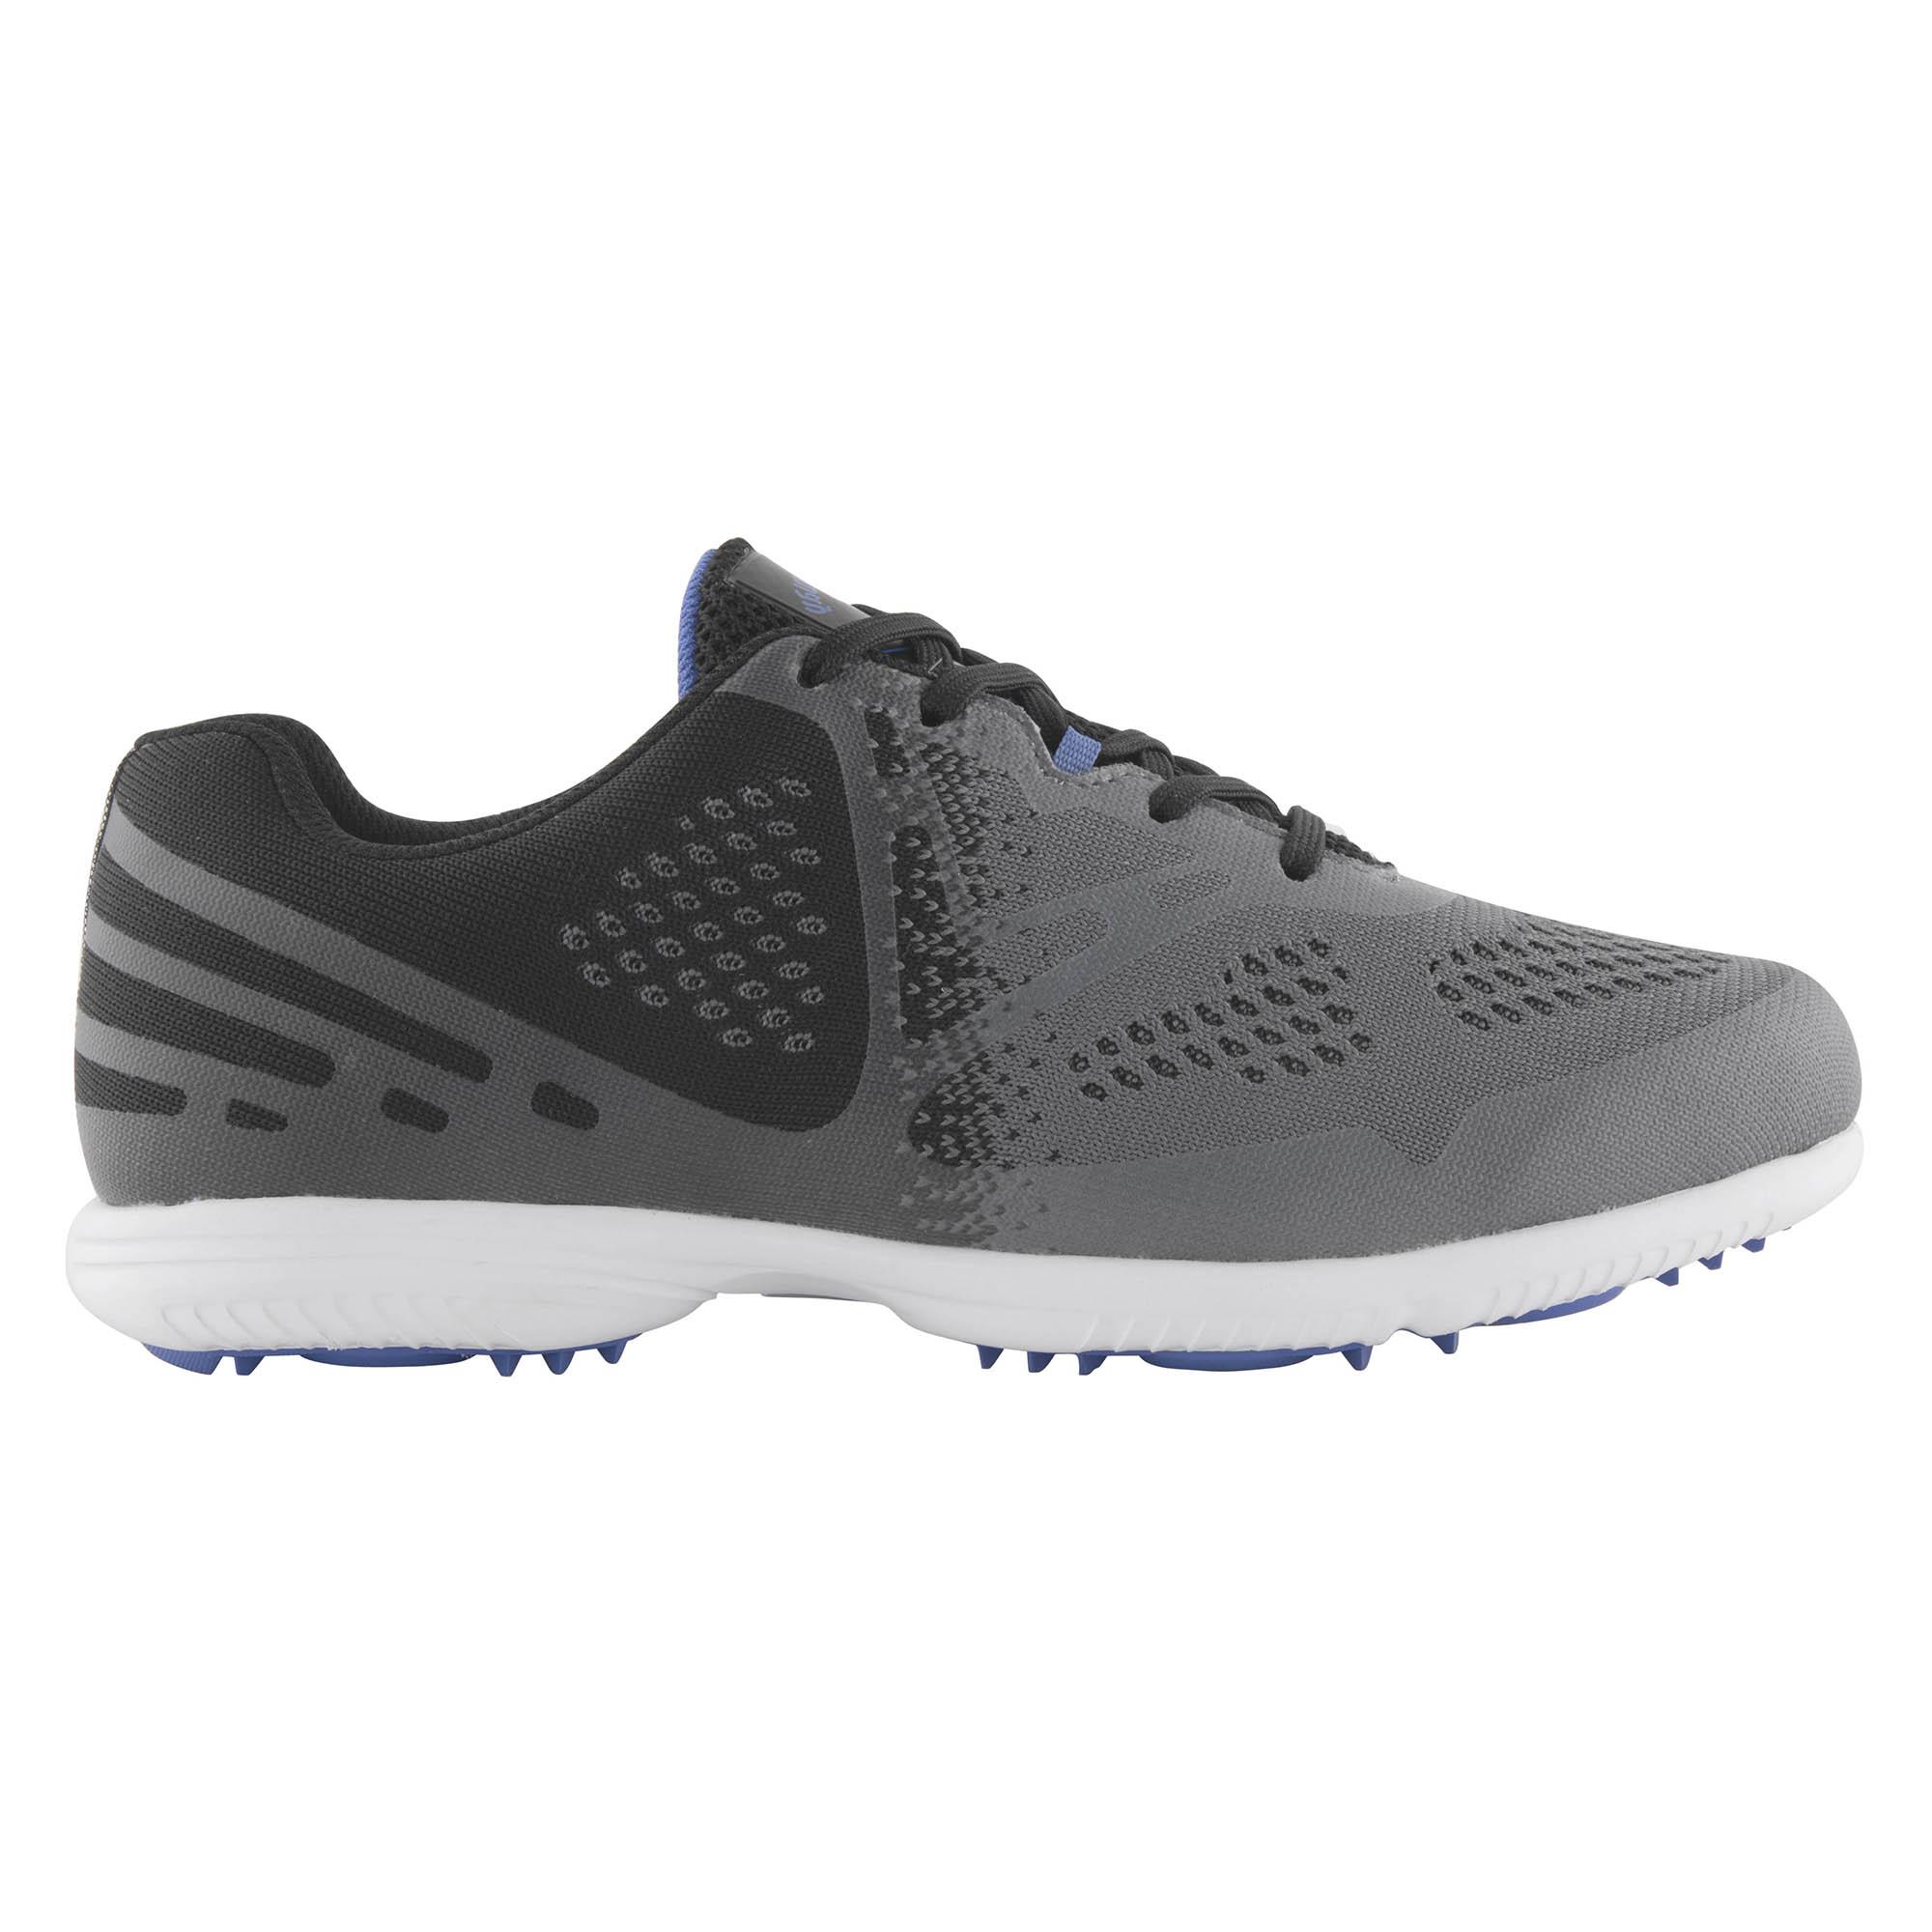 Callaway Halo SL Women's Golf Shoe